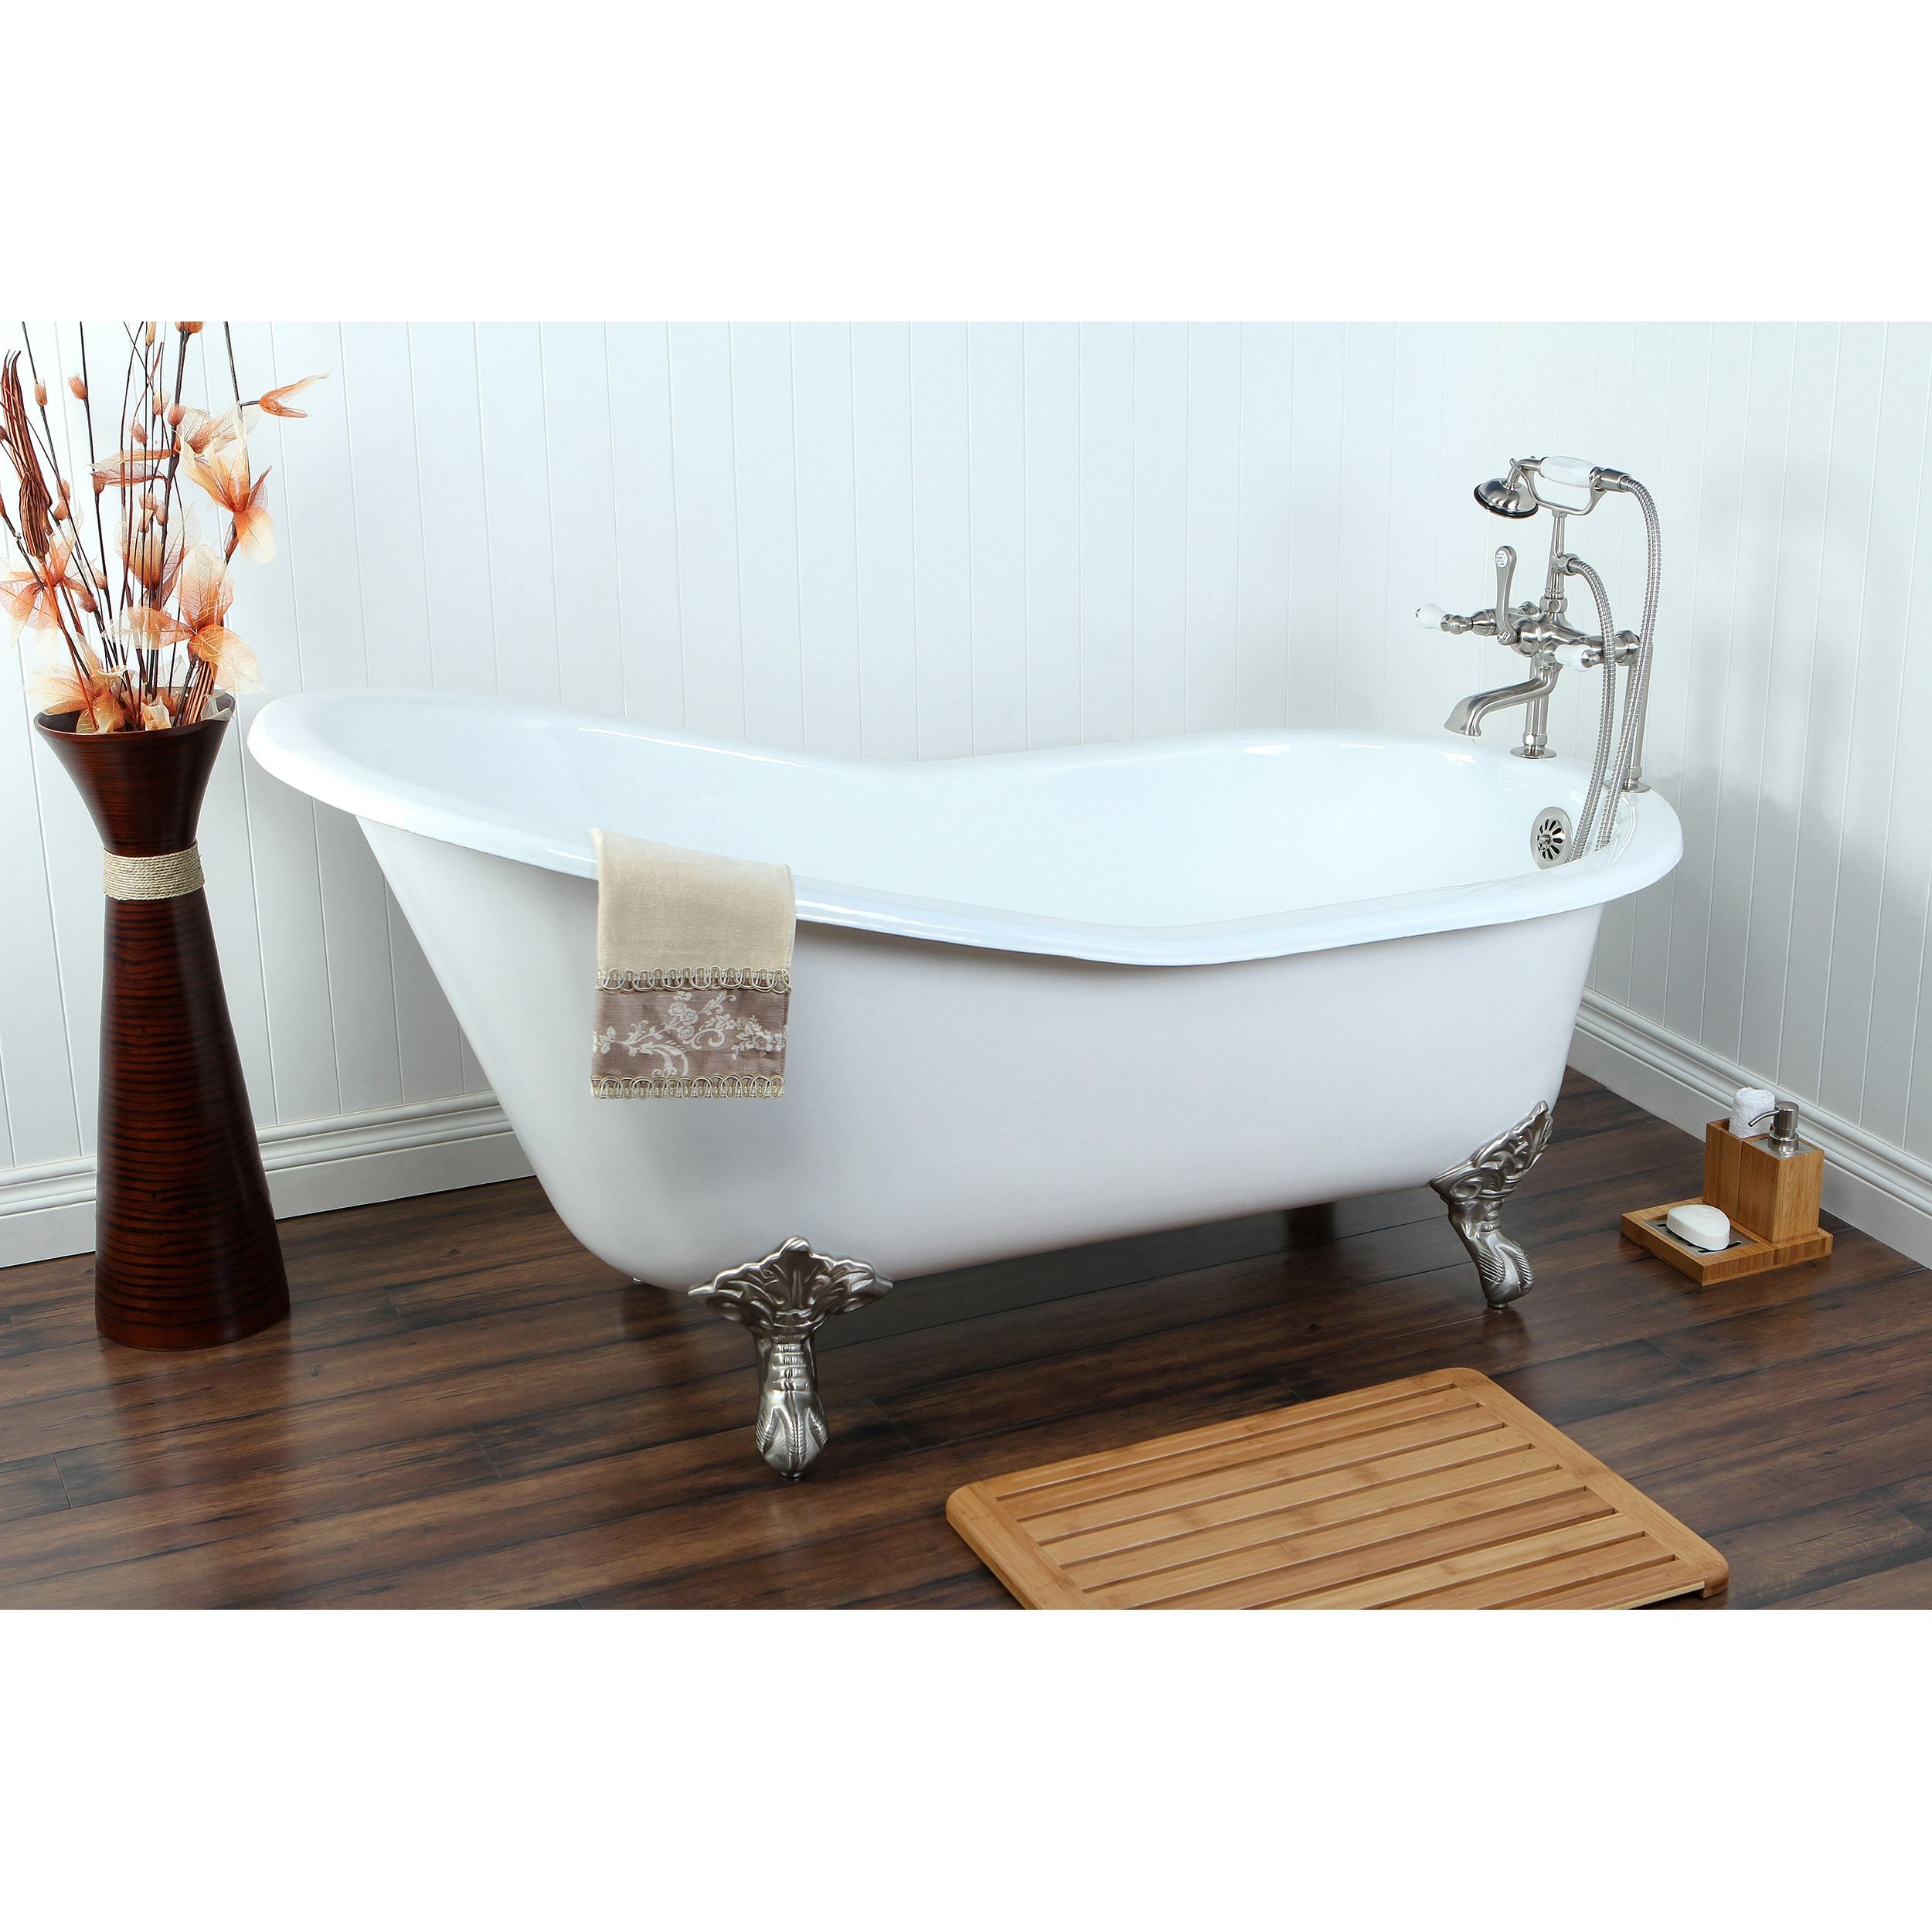 Vintage Slipper 61 Inch Cast Iron Clawfoot Tub With 7 Inch Drillings Tub Soaking Bathtubs Cast Iron Tub